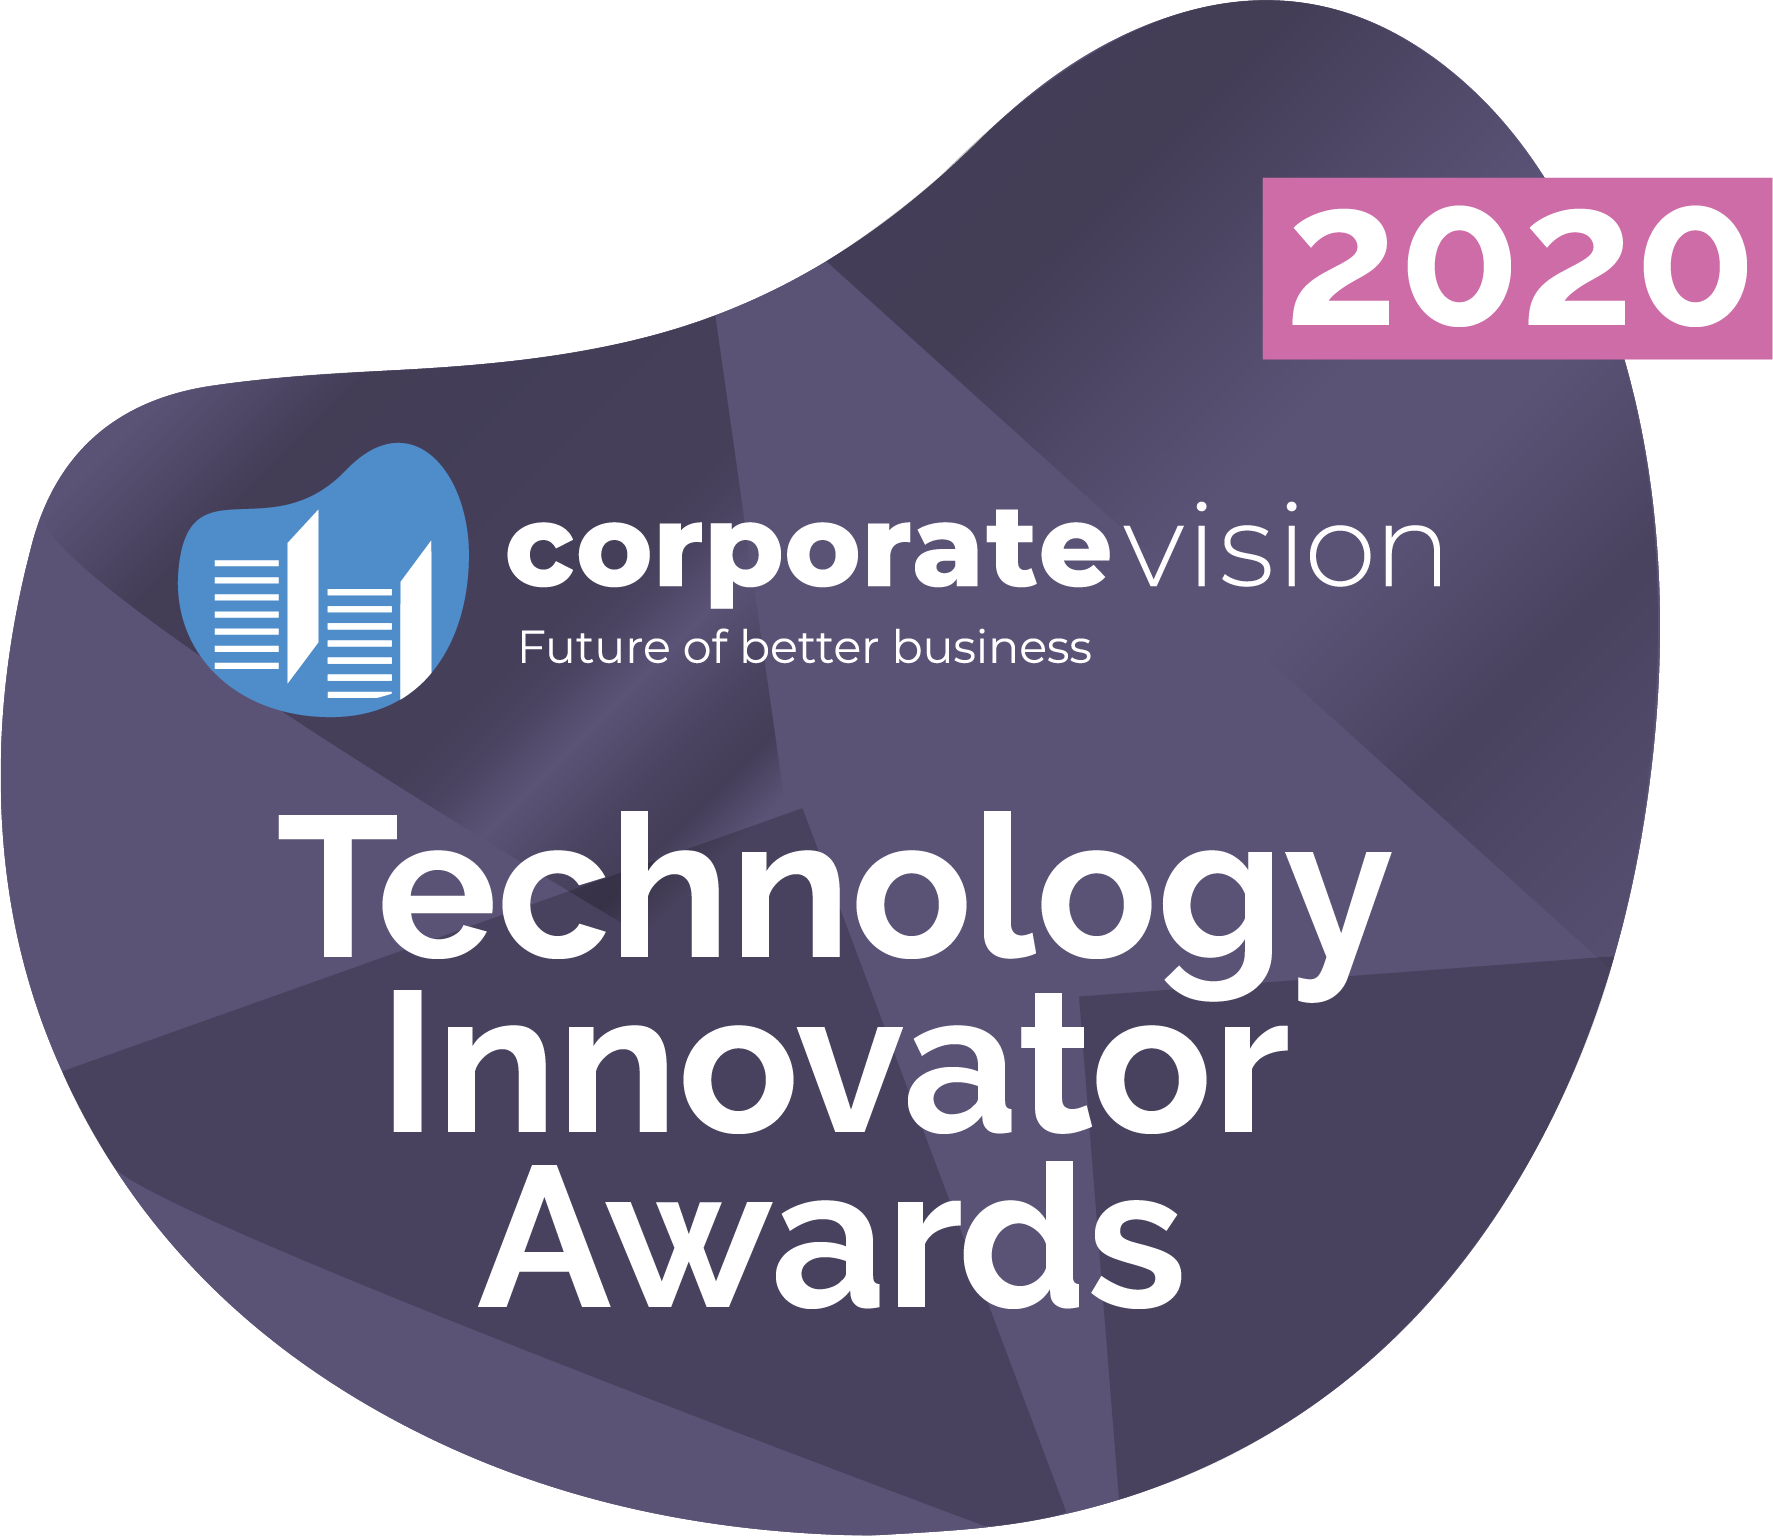 tech-innovator-award 2020